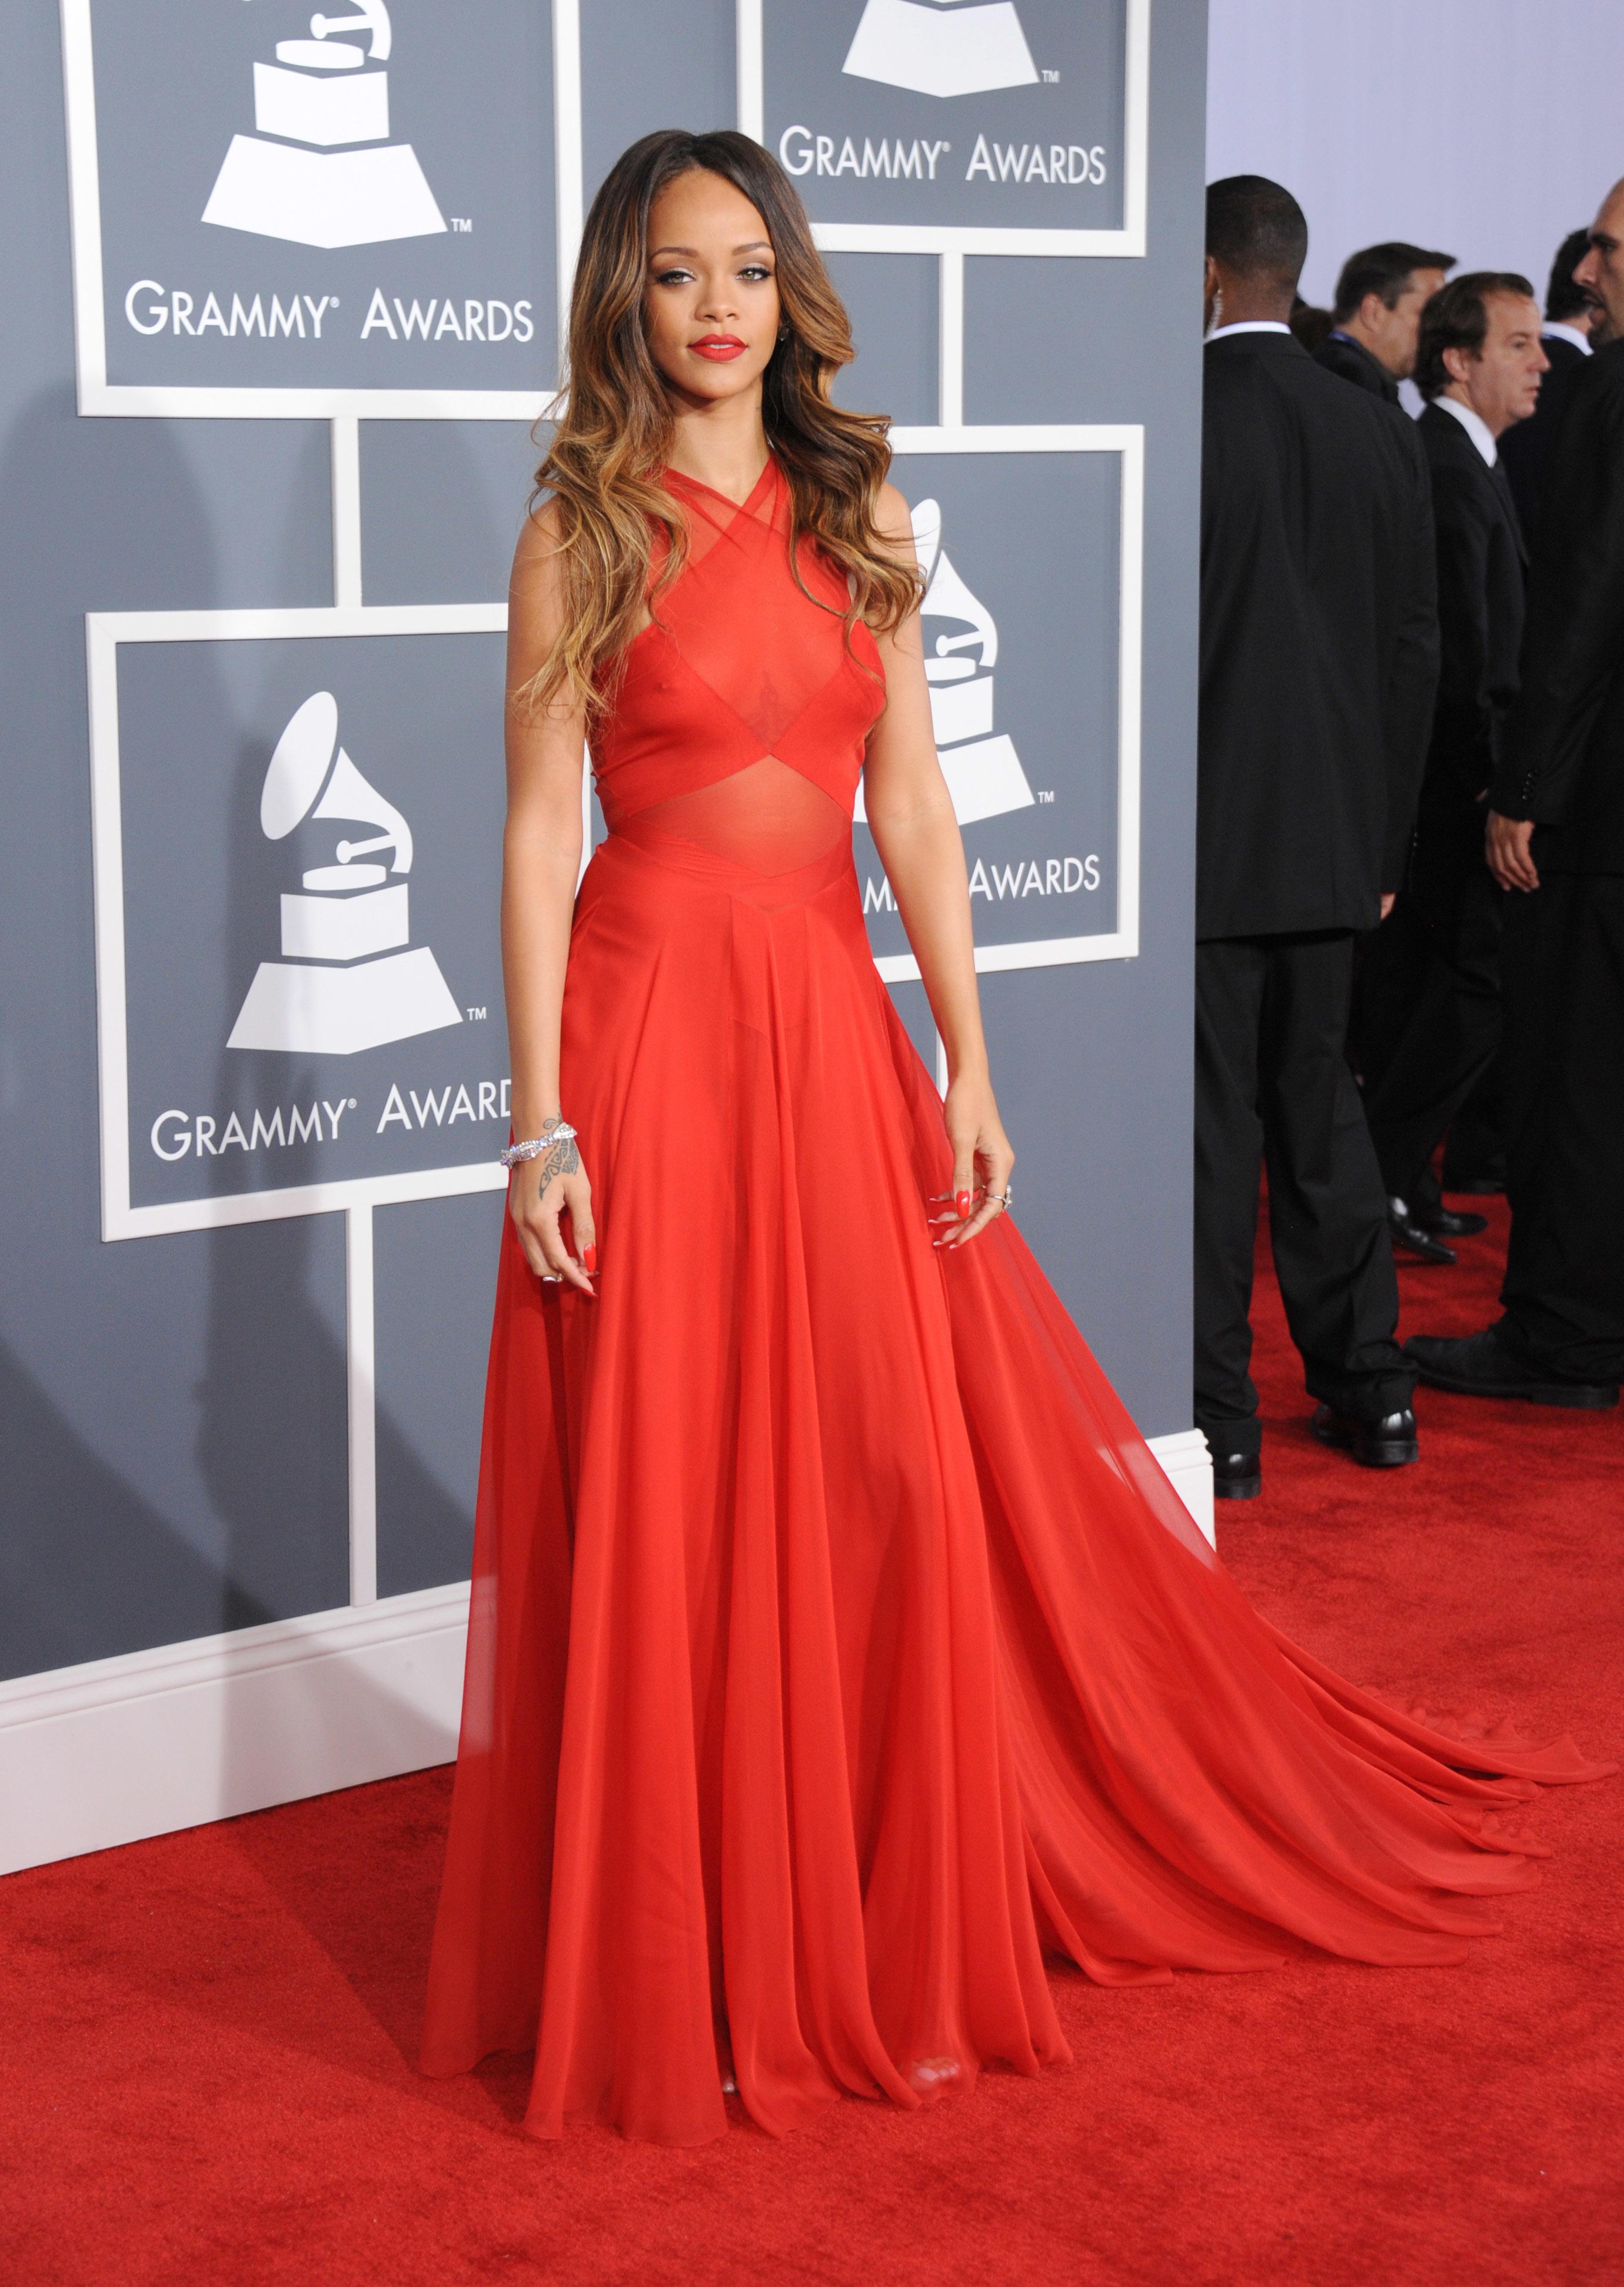 Rihanna red dress 2013 grammy awards